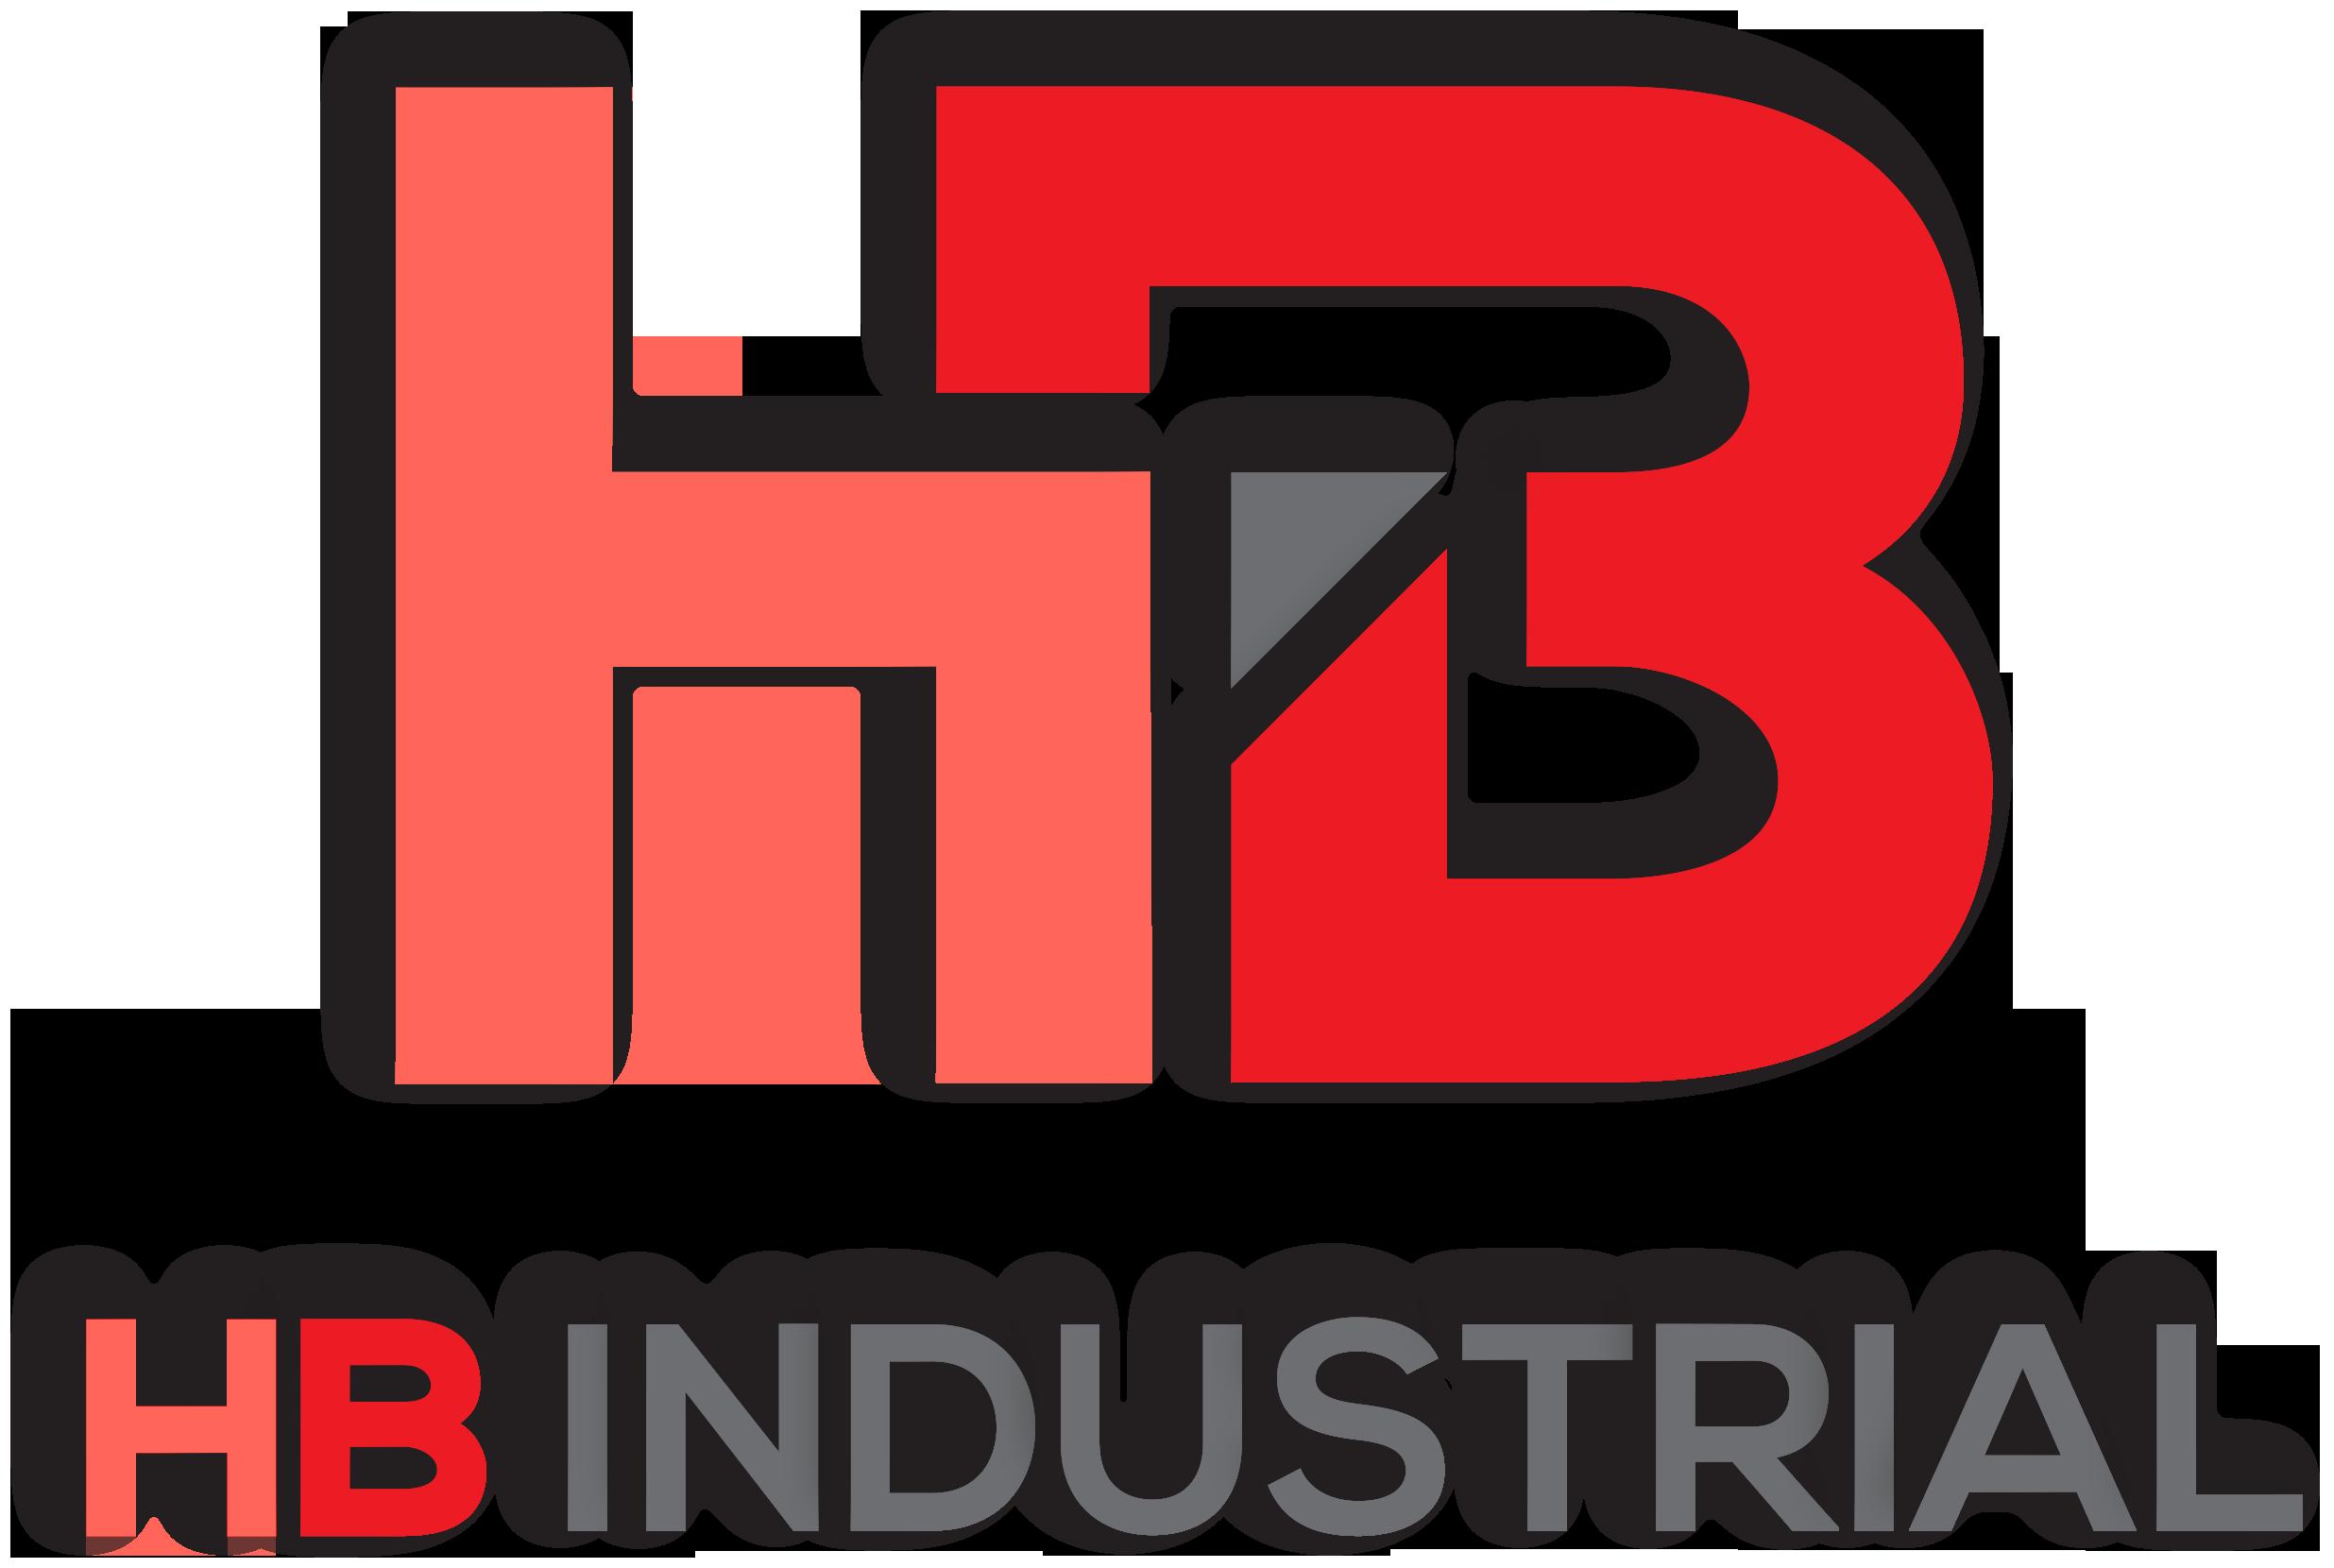 HB Industrial